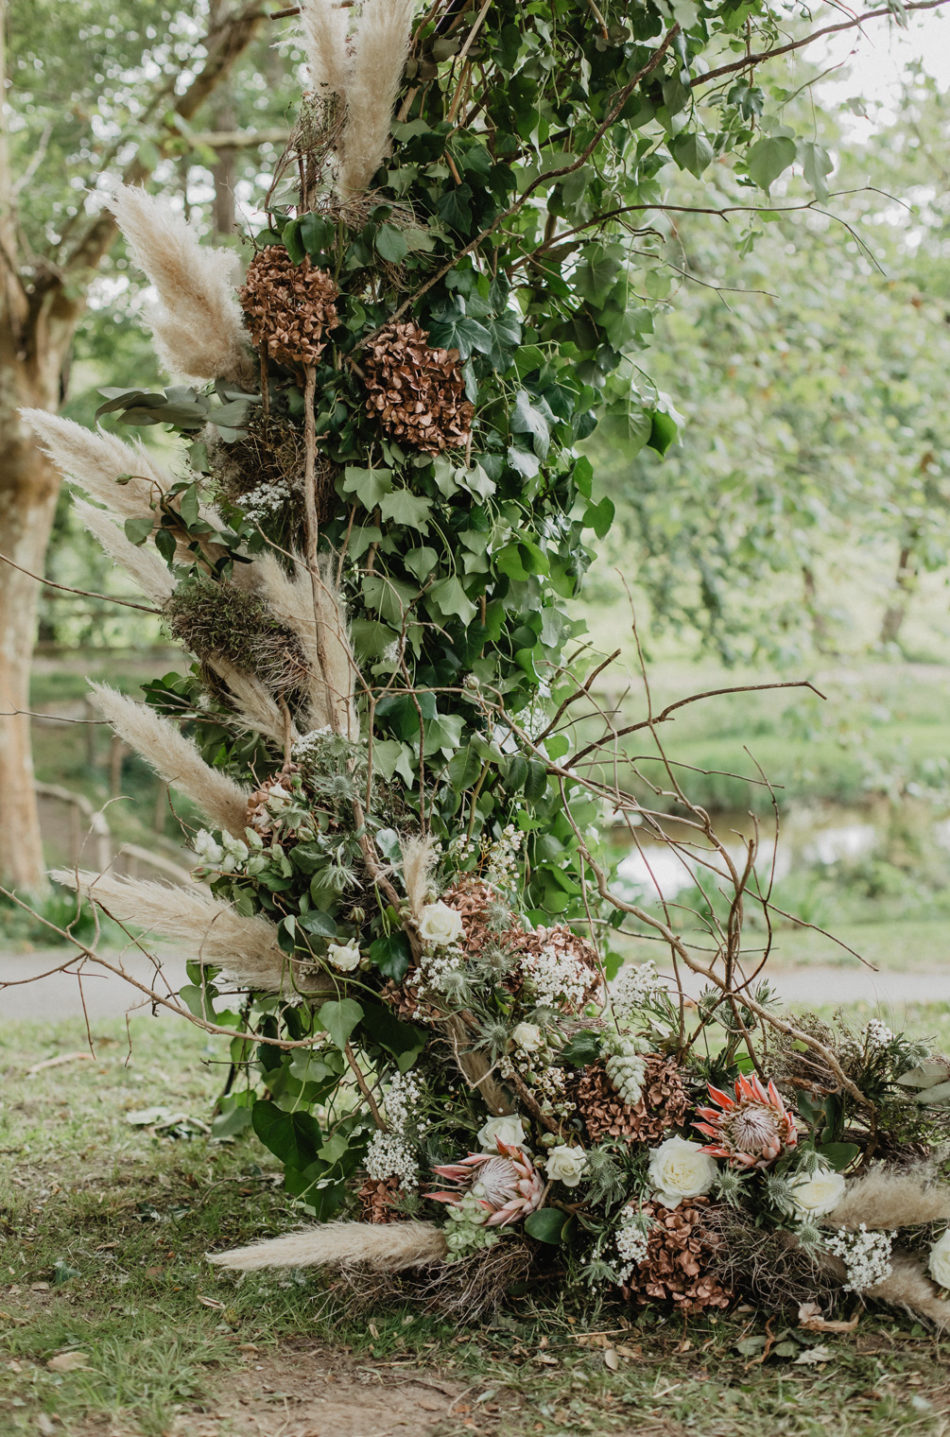 deco fleurs sechee et pampa